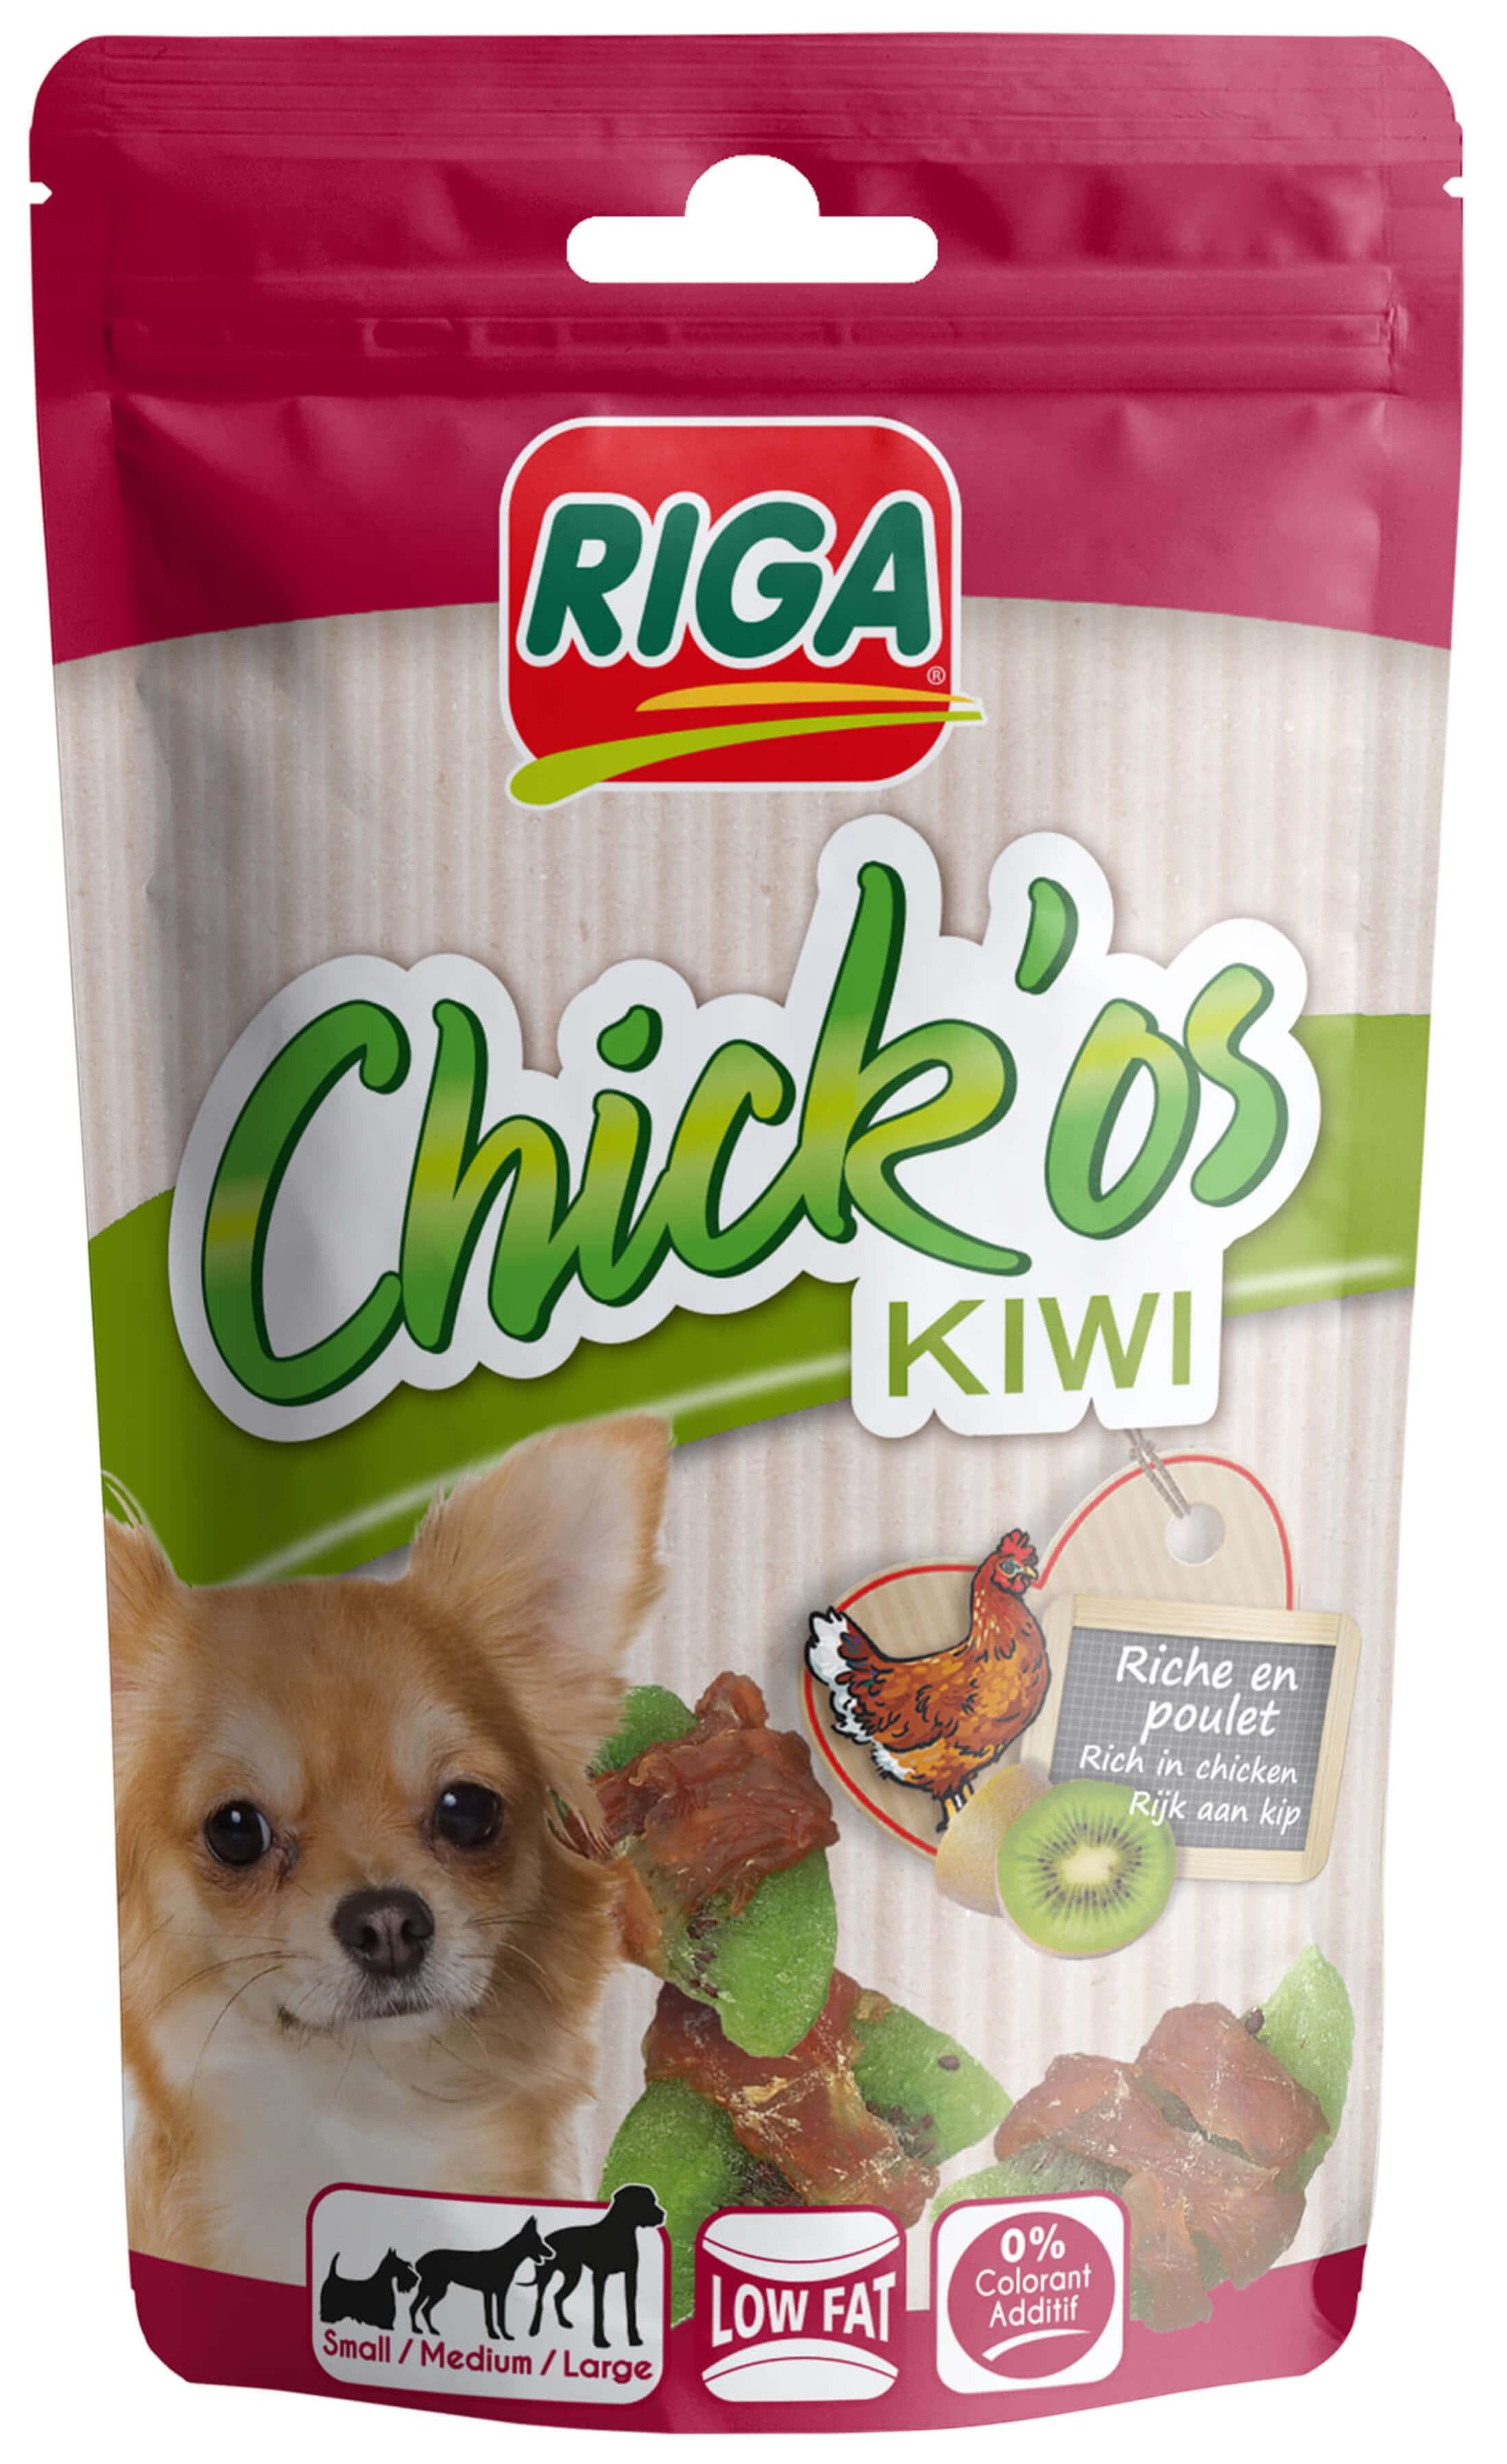 Chick'os Kiwi